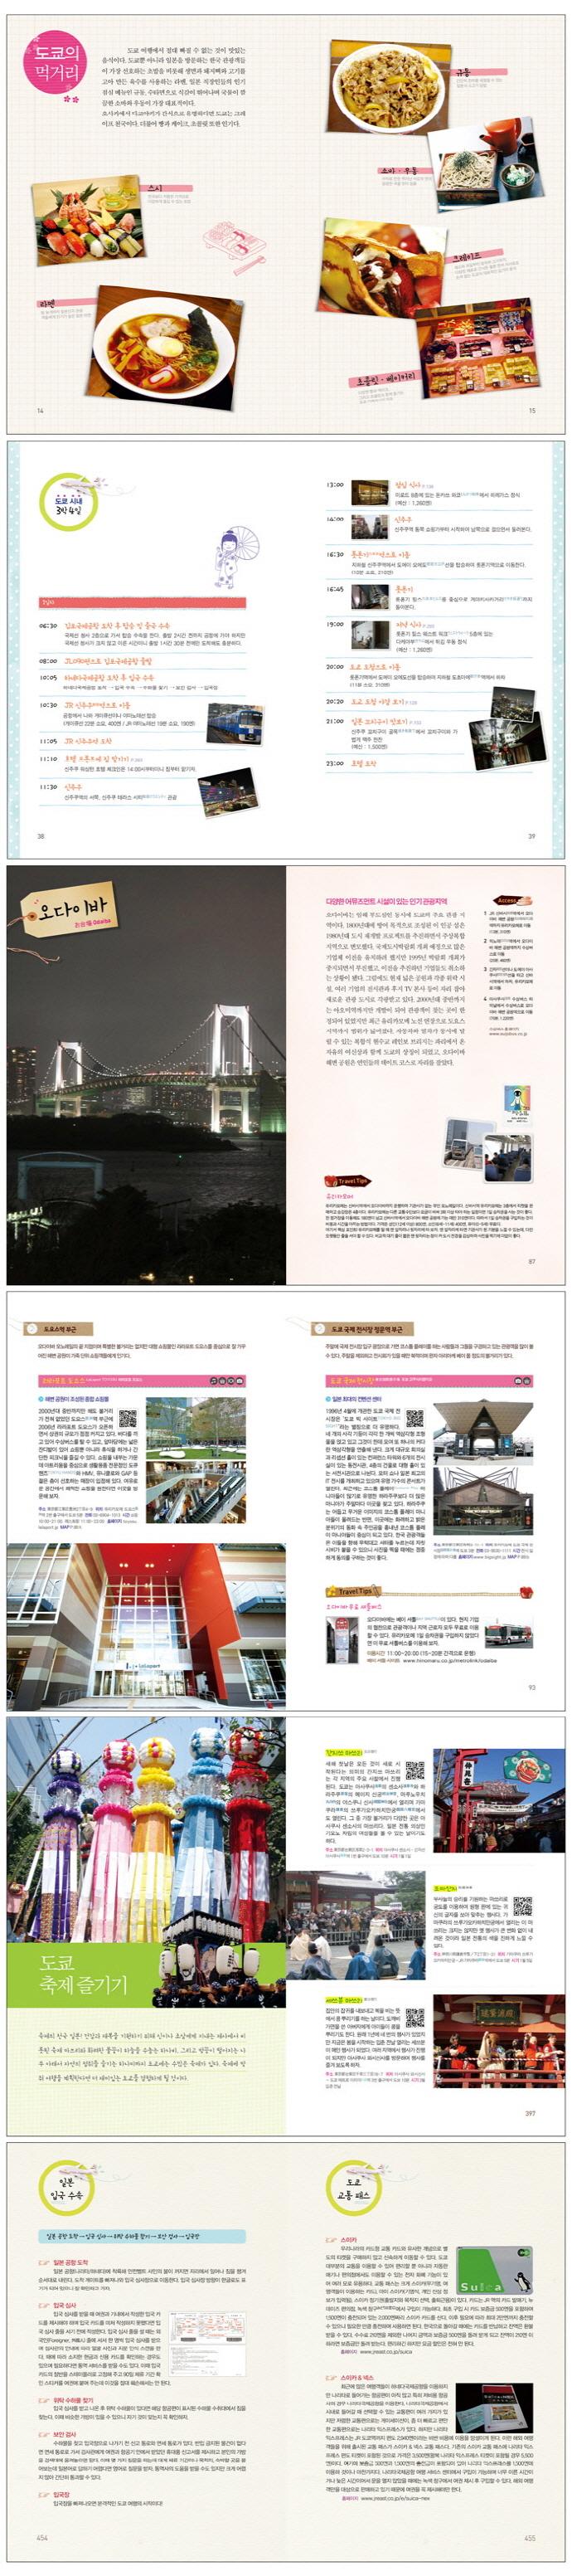 ENJOY 도쿄(2017) 도서 상세이미지